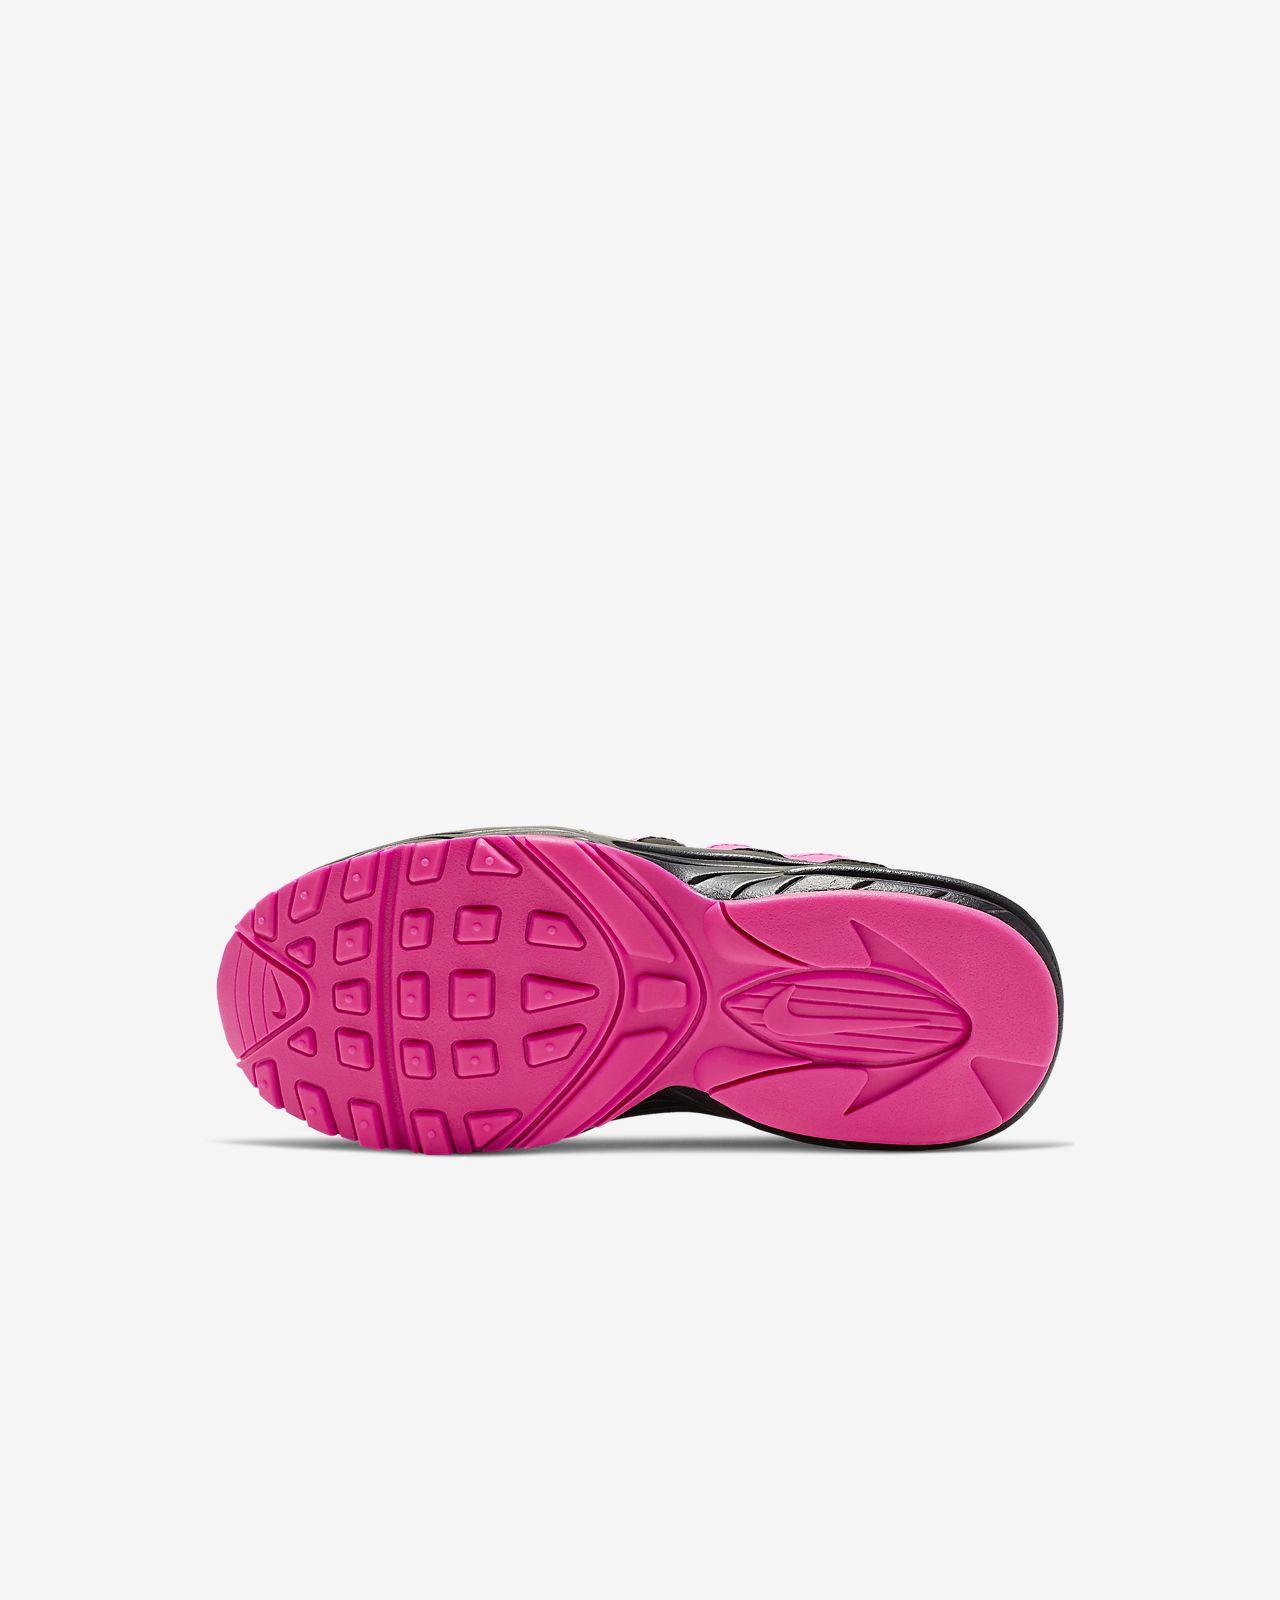 71b053c306 Nike Air Max 95 Little Kids' Shoe. Nike.com